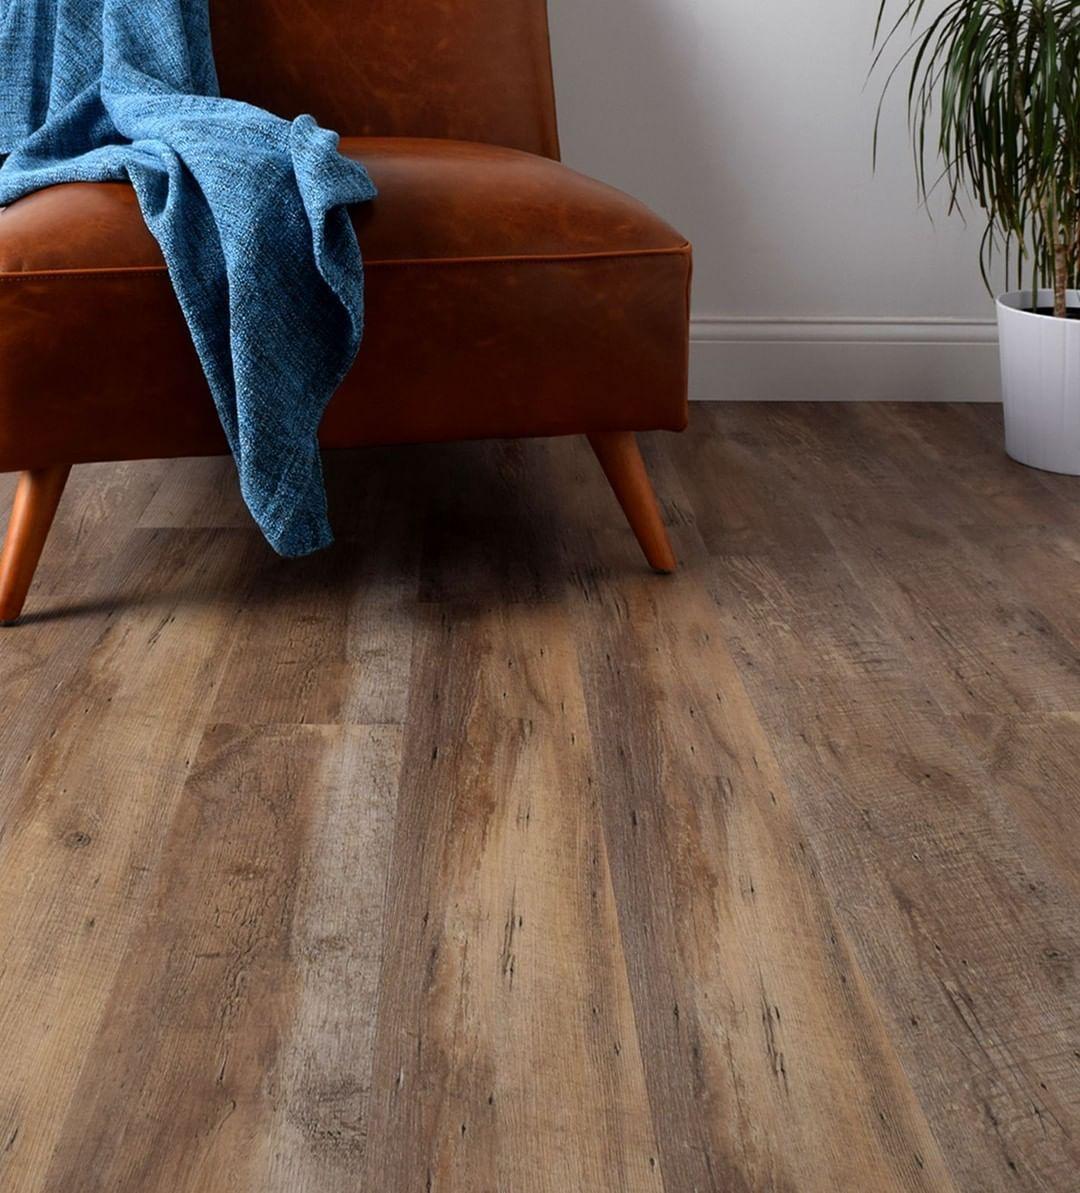 Rigid Core Cliq Vinyl Flooring Flooring Vinyl Plank